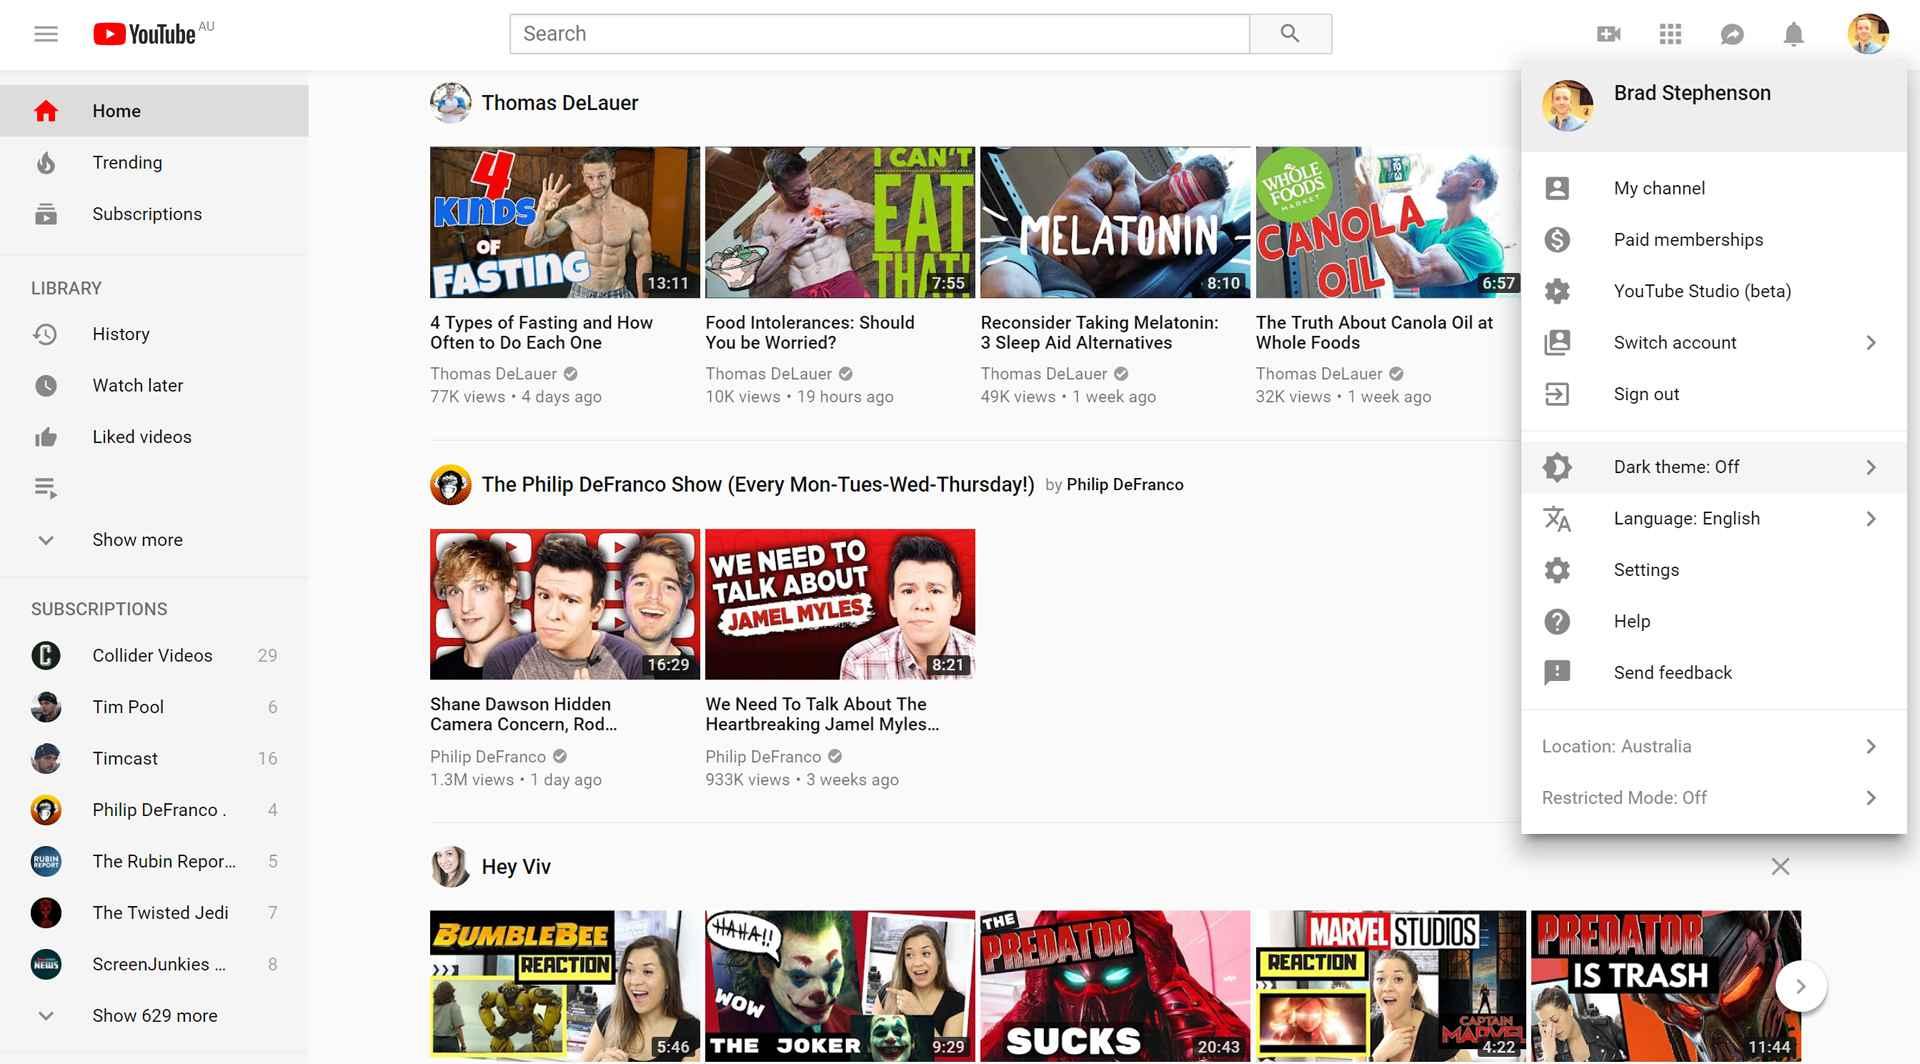 How to Turn on YouTube's Dark Theme